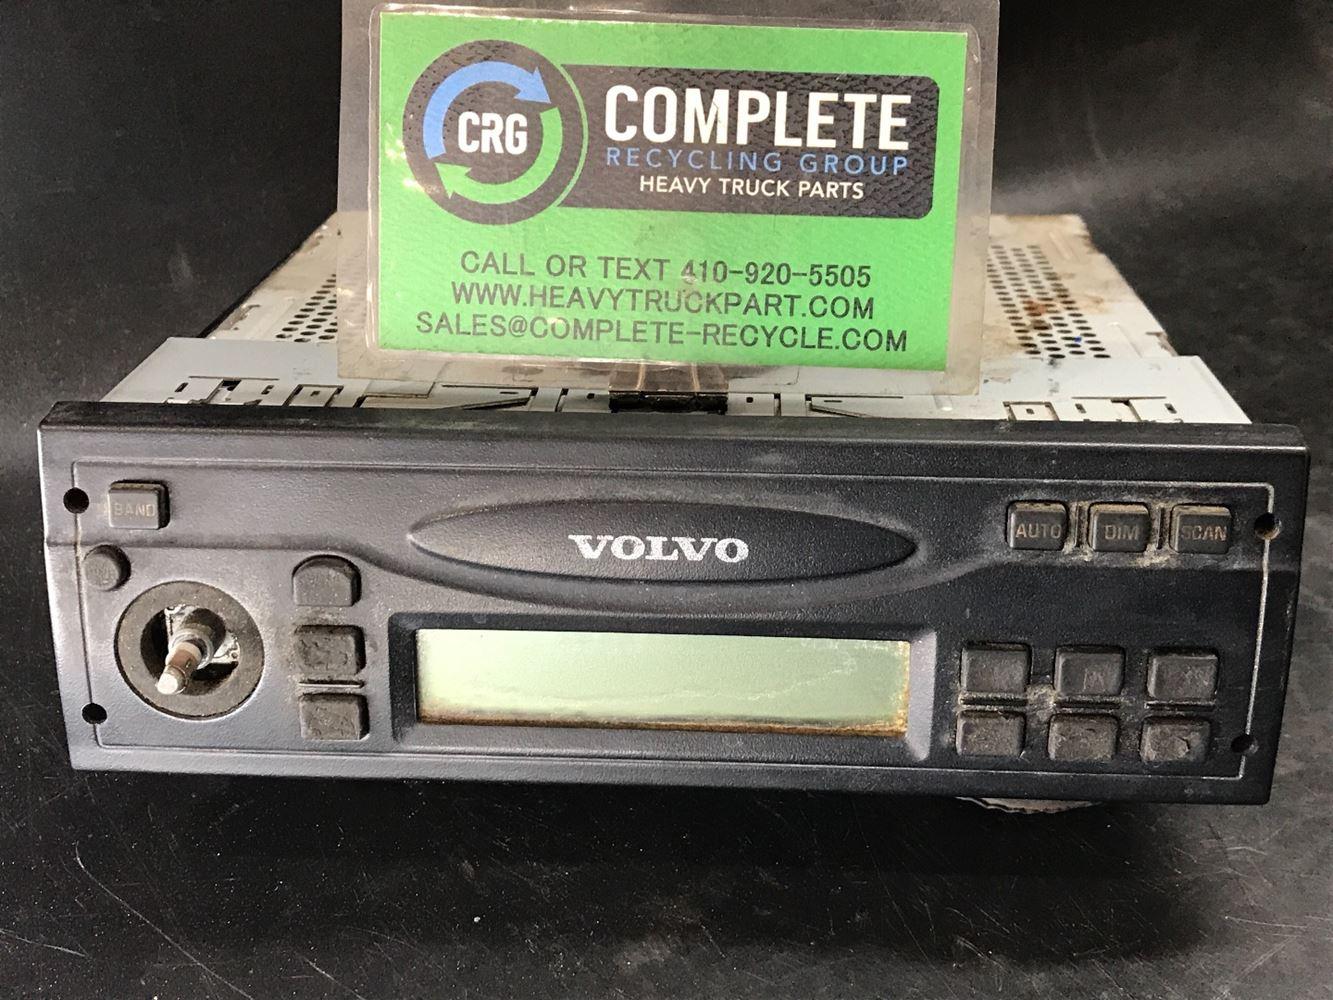 2009 VOLVO VNM RADIO TRUCK PARTS #719470